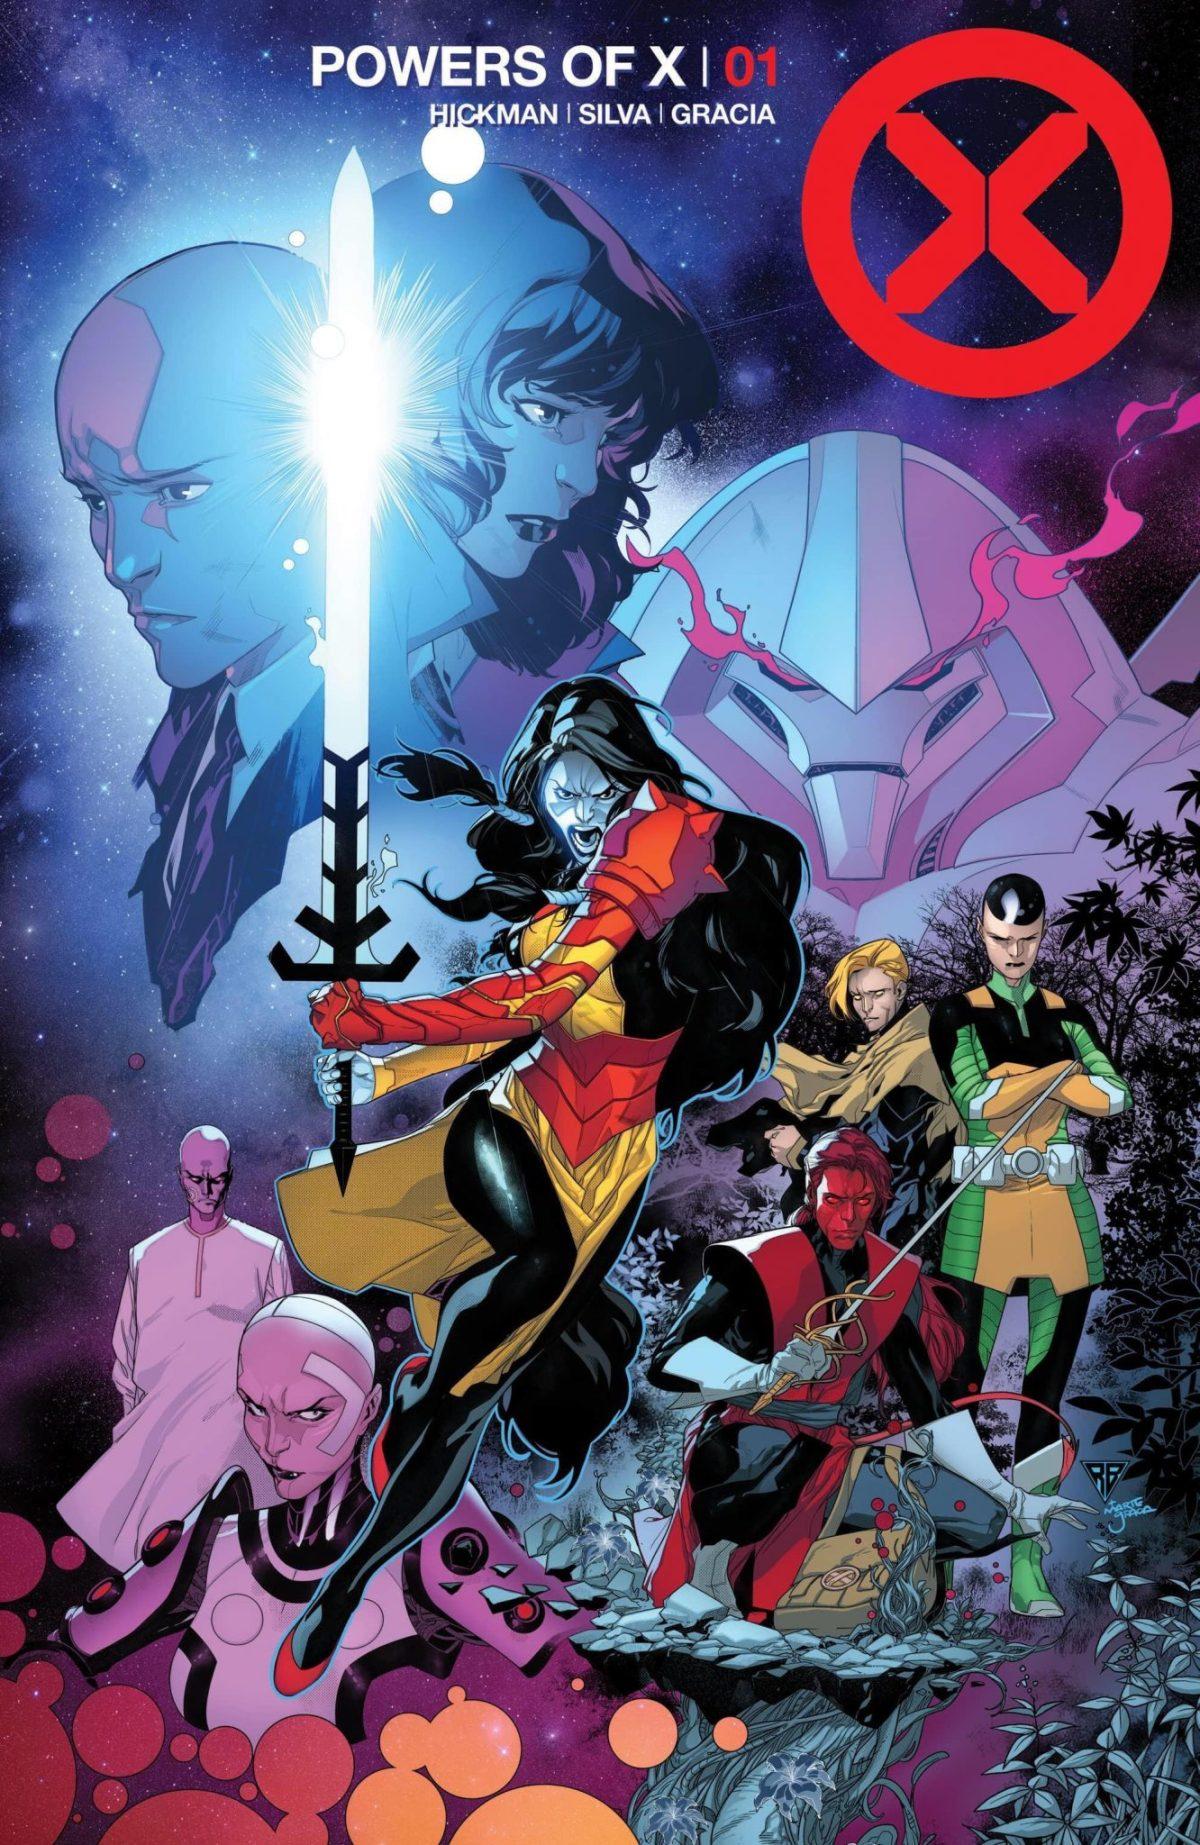 Os X-Men de Jonathan Hickman - Powers of X #1 - Blog Farofeiros